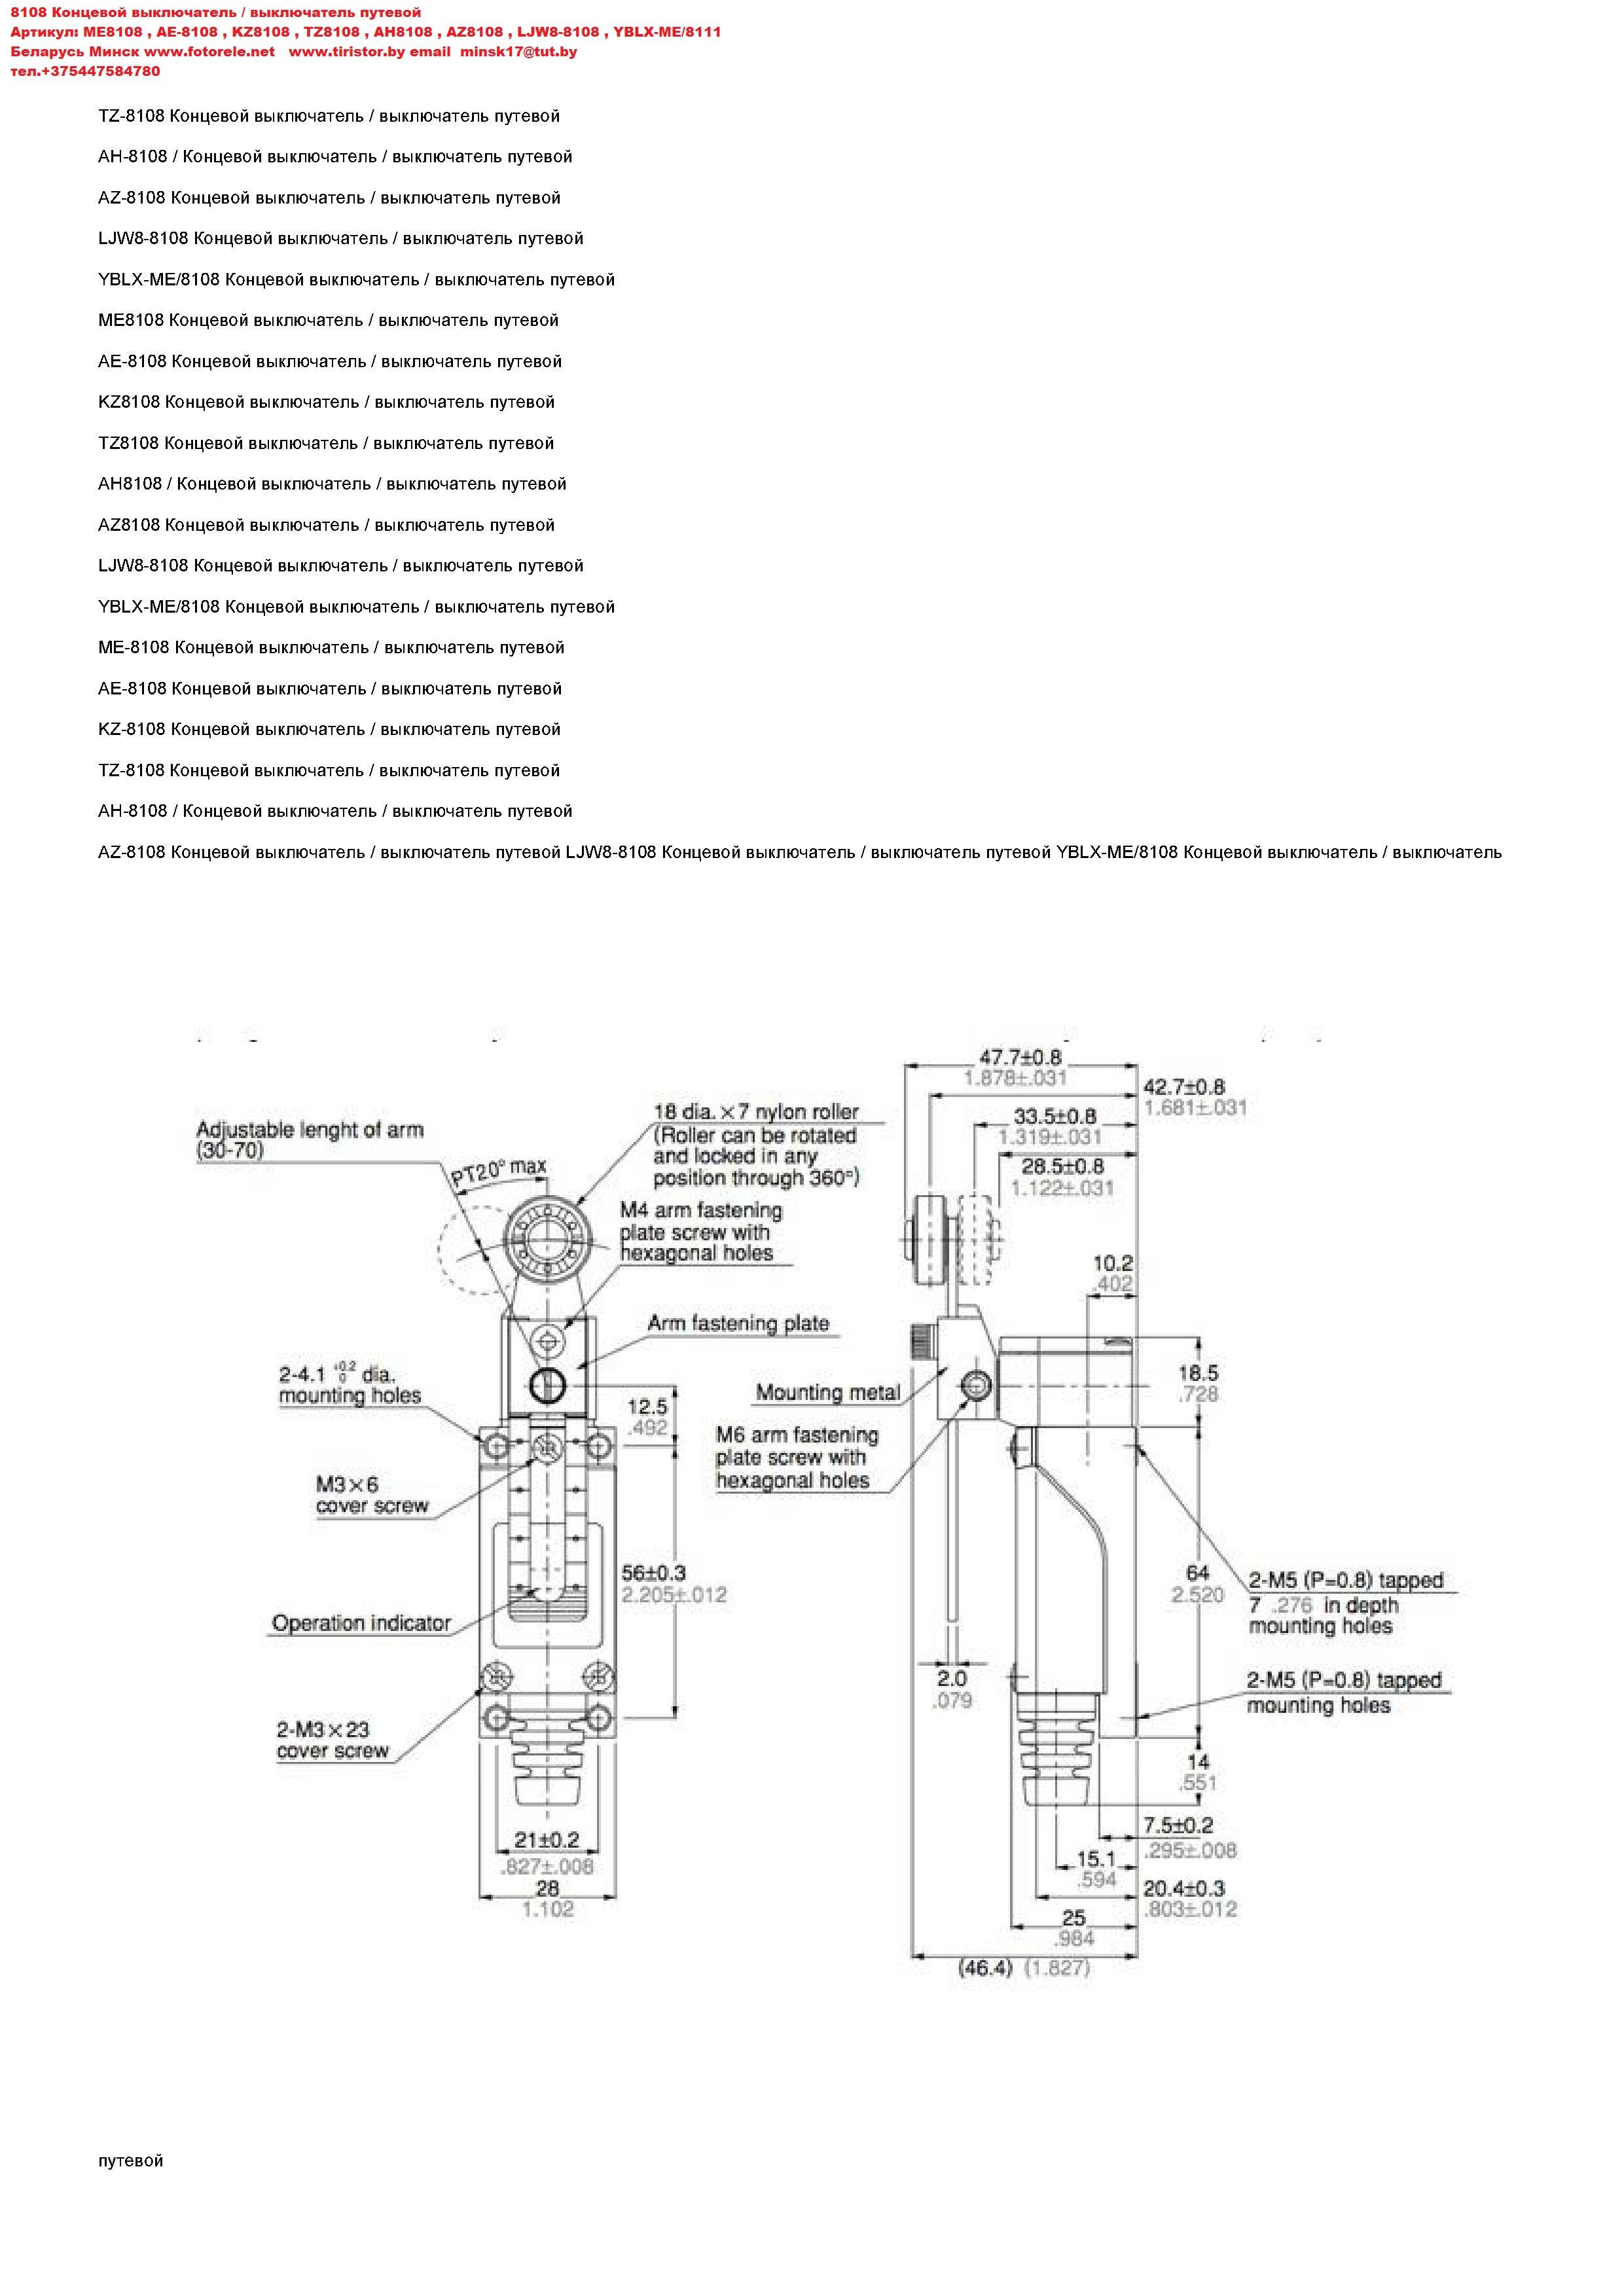 8108, Концевой выключатель , выключатель путевой Артикул: ME8108 , AE-8108 , KZ8108 , TZ8108 , AH8108 , AZ8108 , LJW8-8108 , YBLX-ME/8108